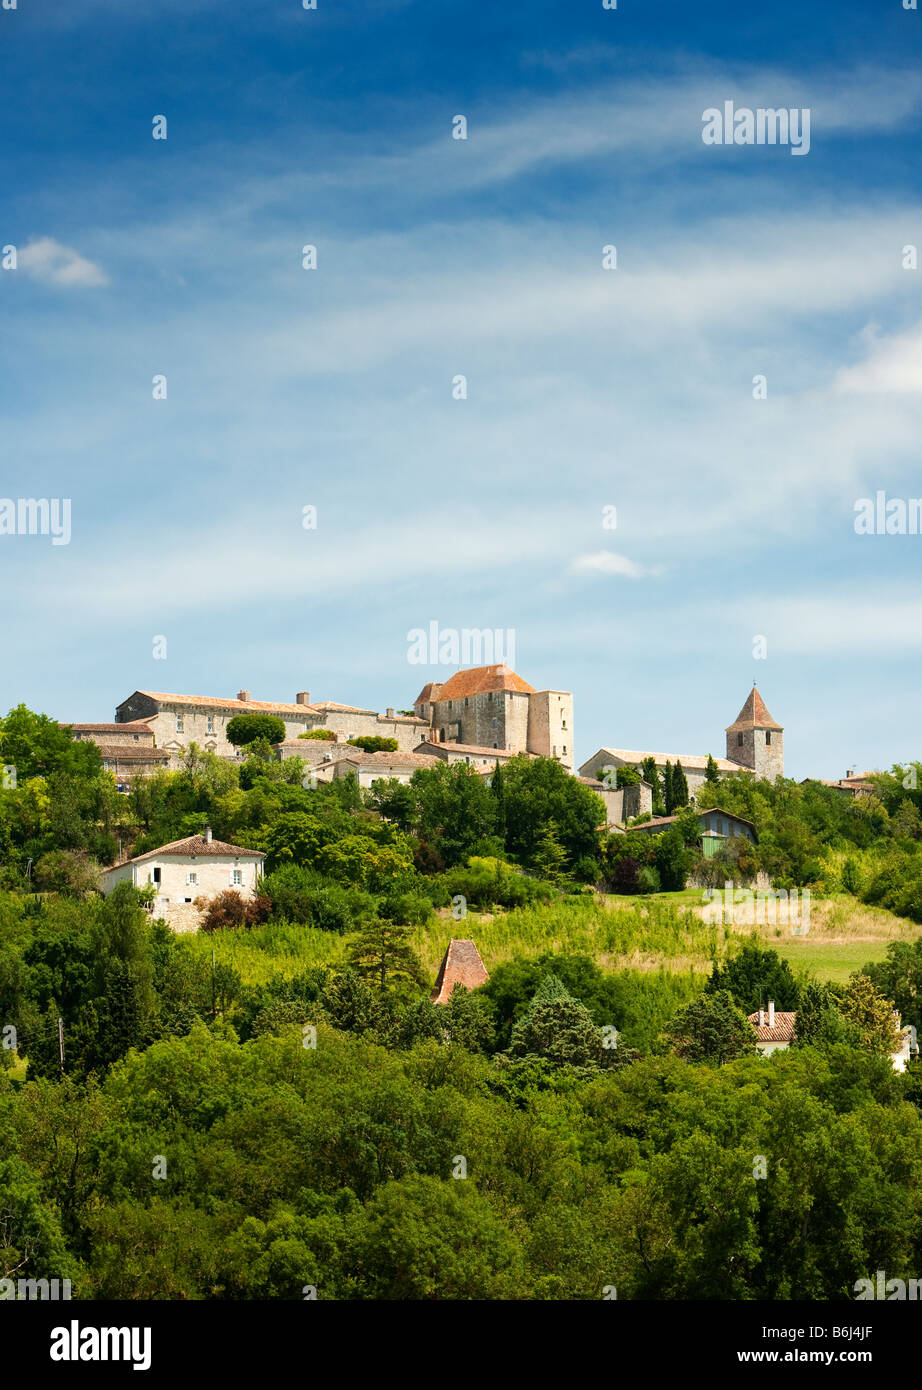 La ville de Gramont en Tarn et Garonne, France, Europe Photo Stock